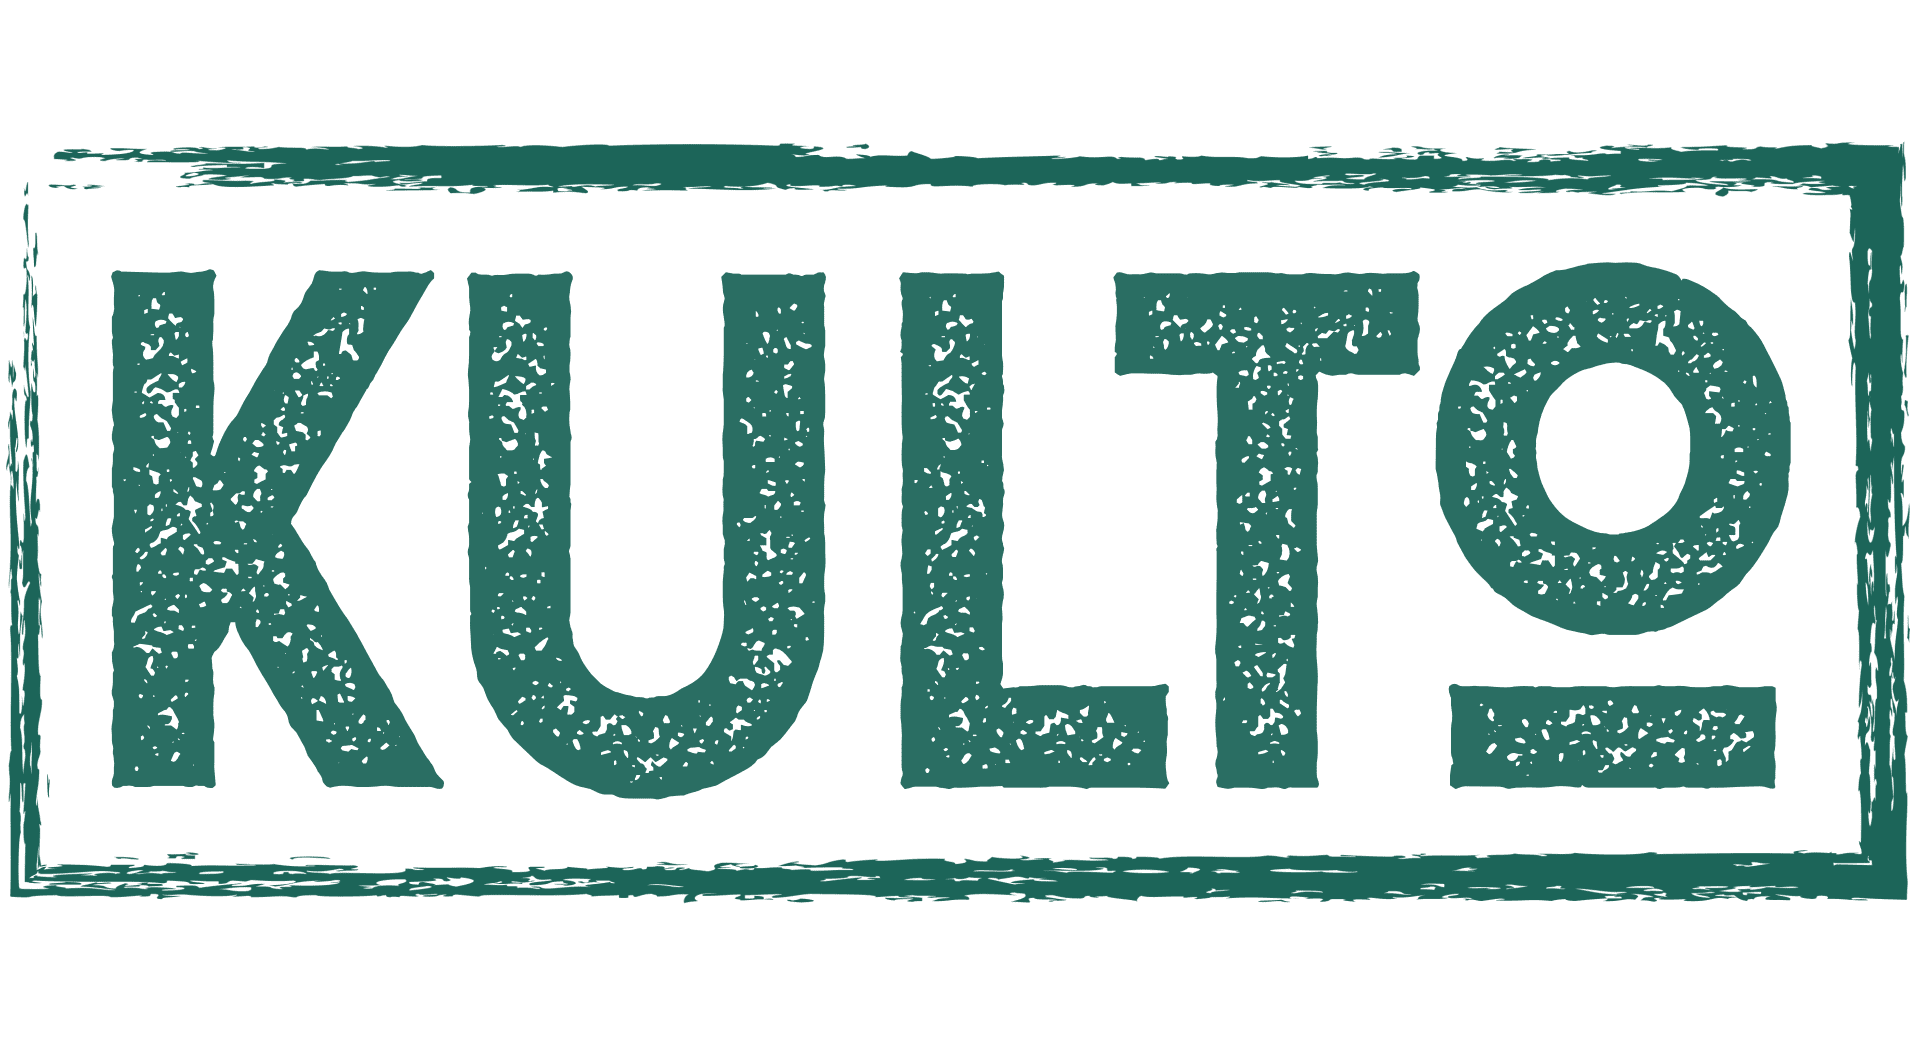 KULTO logo